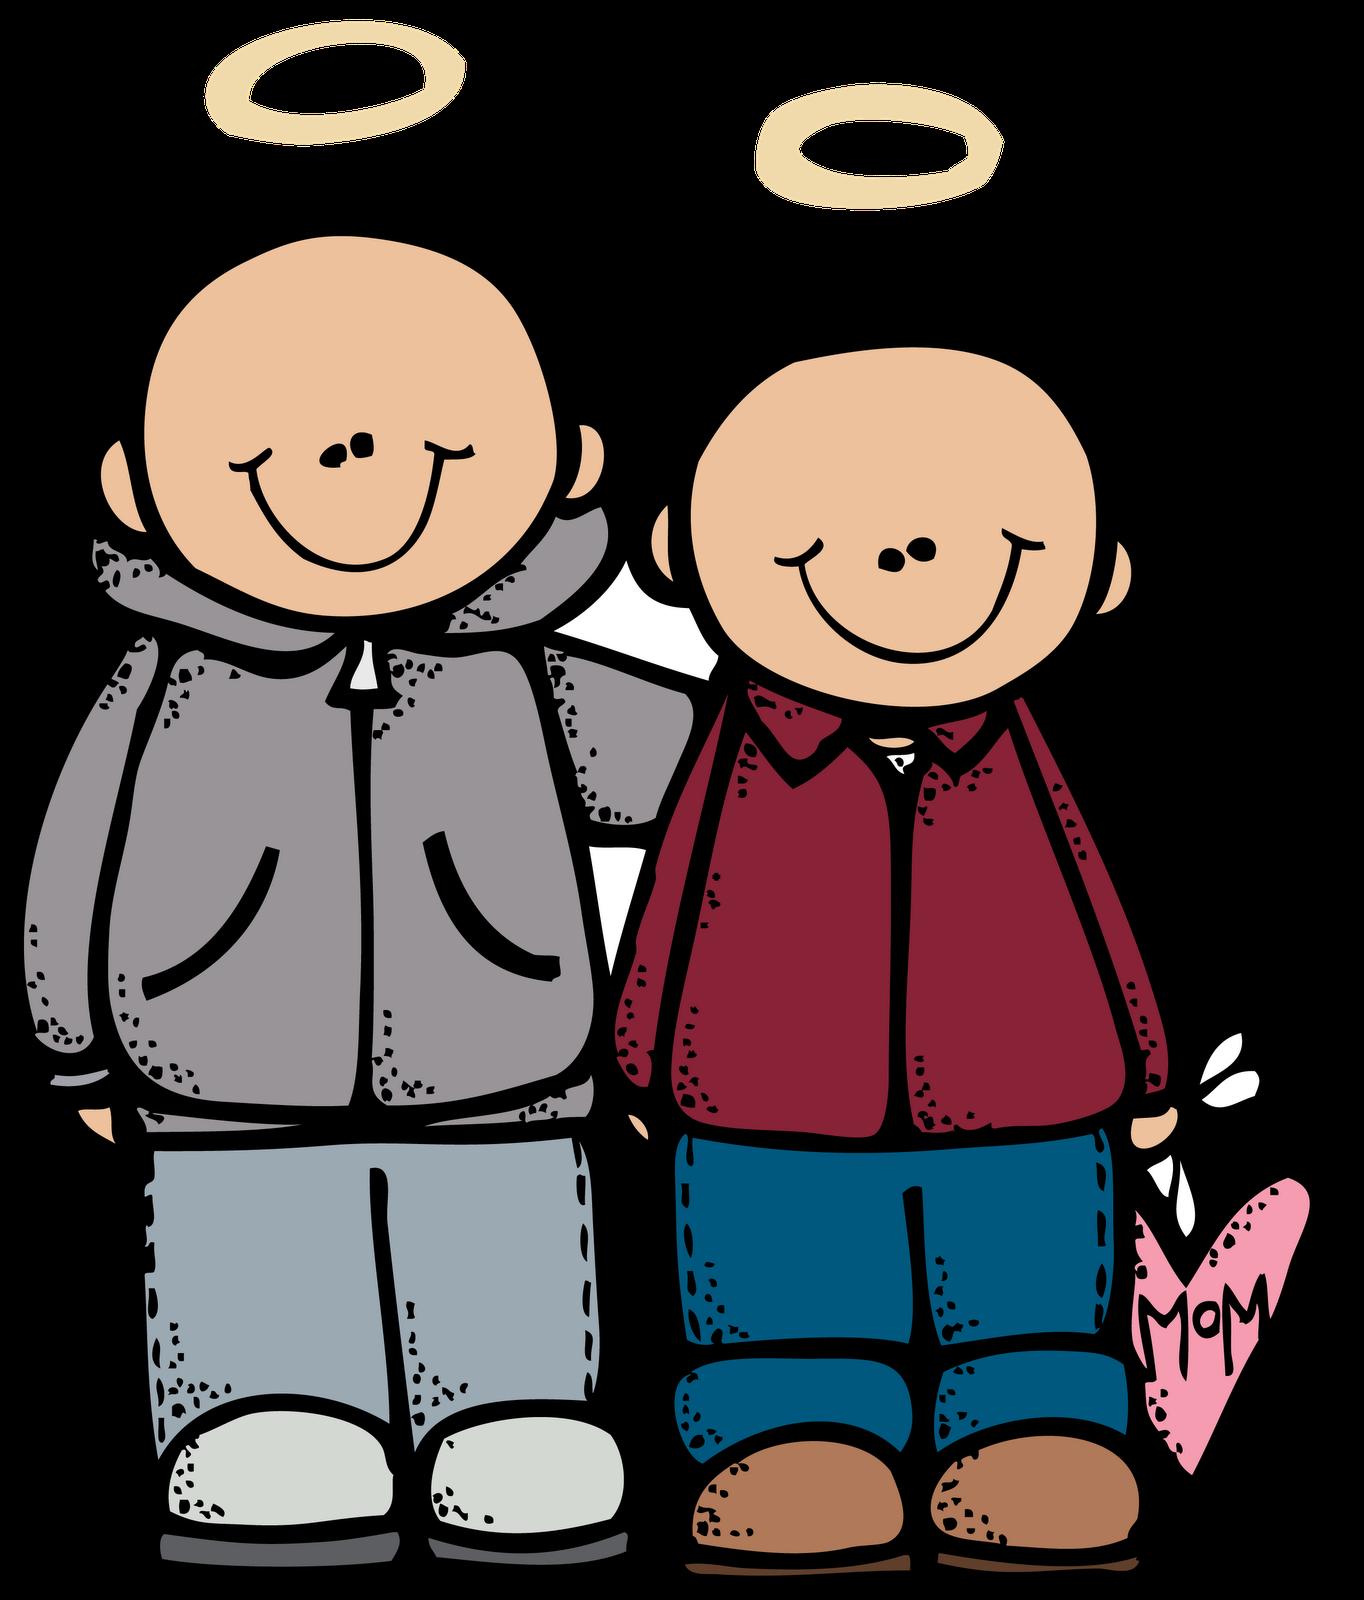 Family clipart hug. Melonheadz lds illustrating pinterest